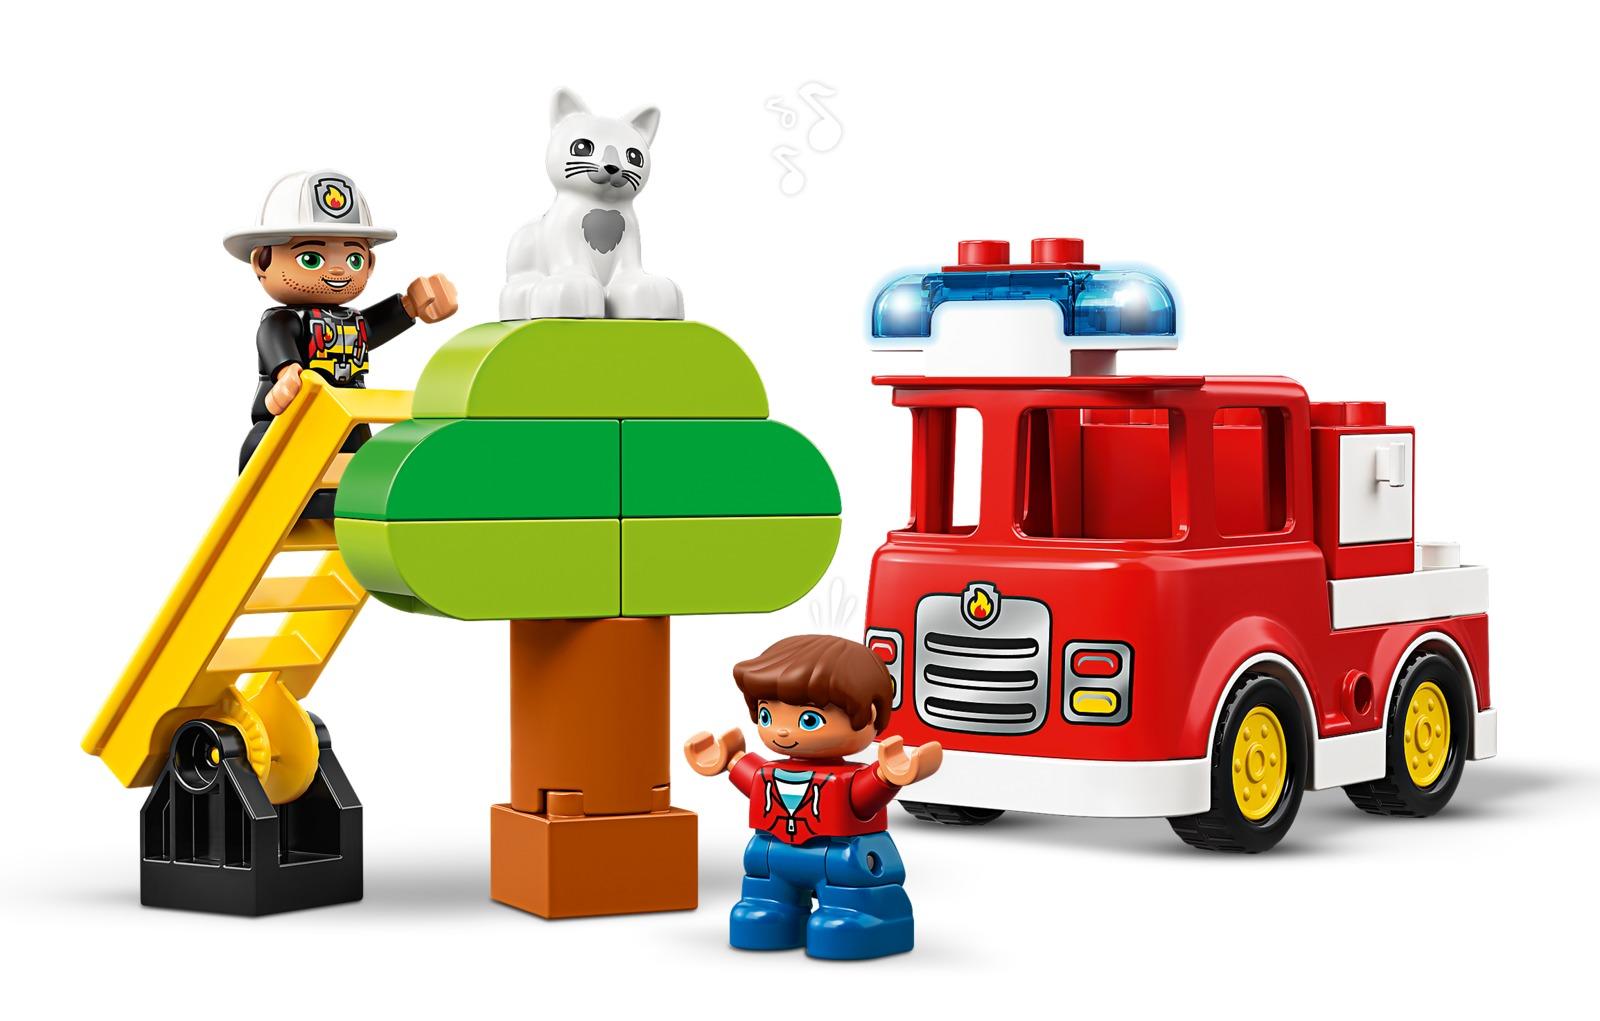 LEGO DUPLO - Fire Truck image